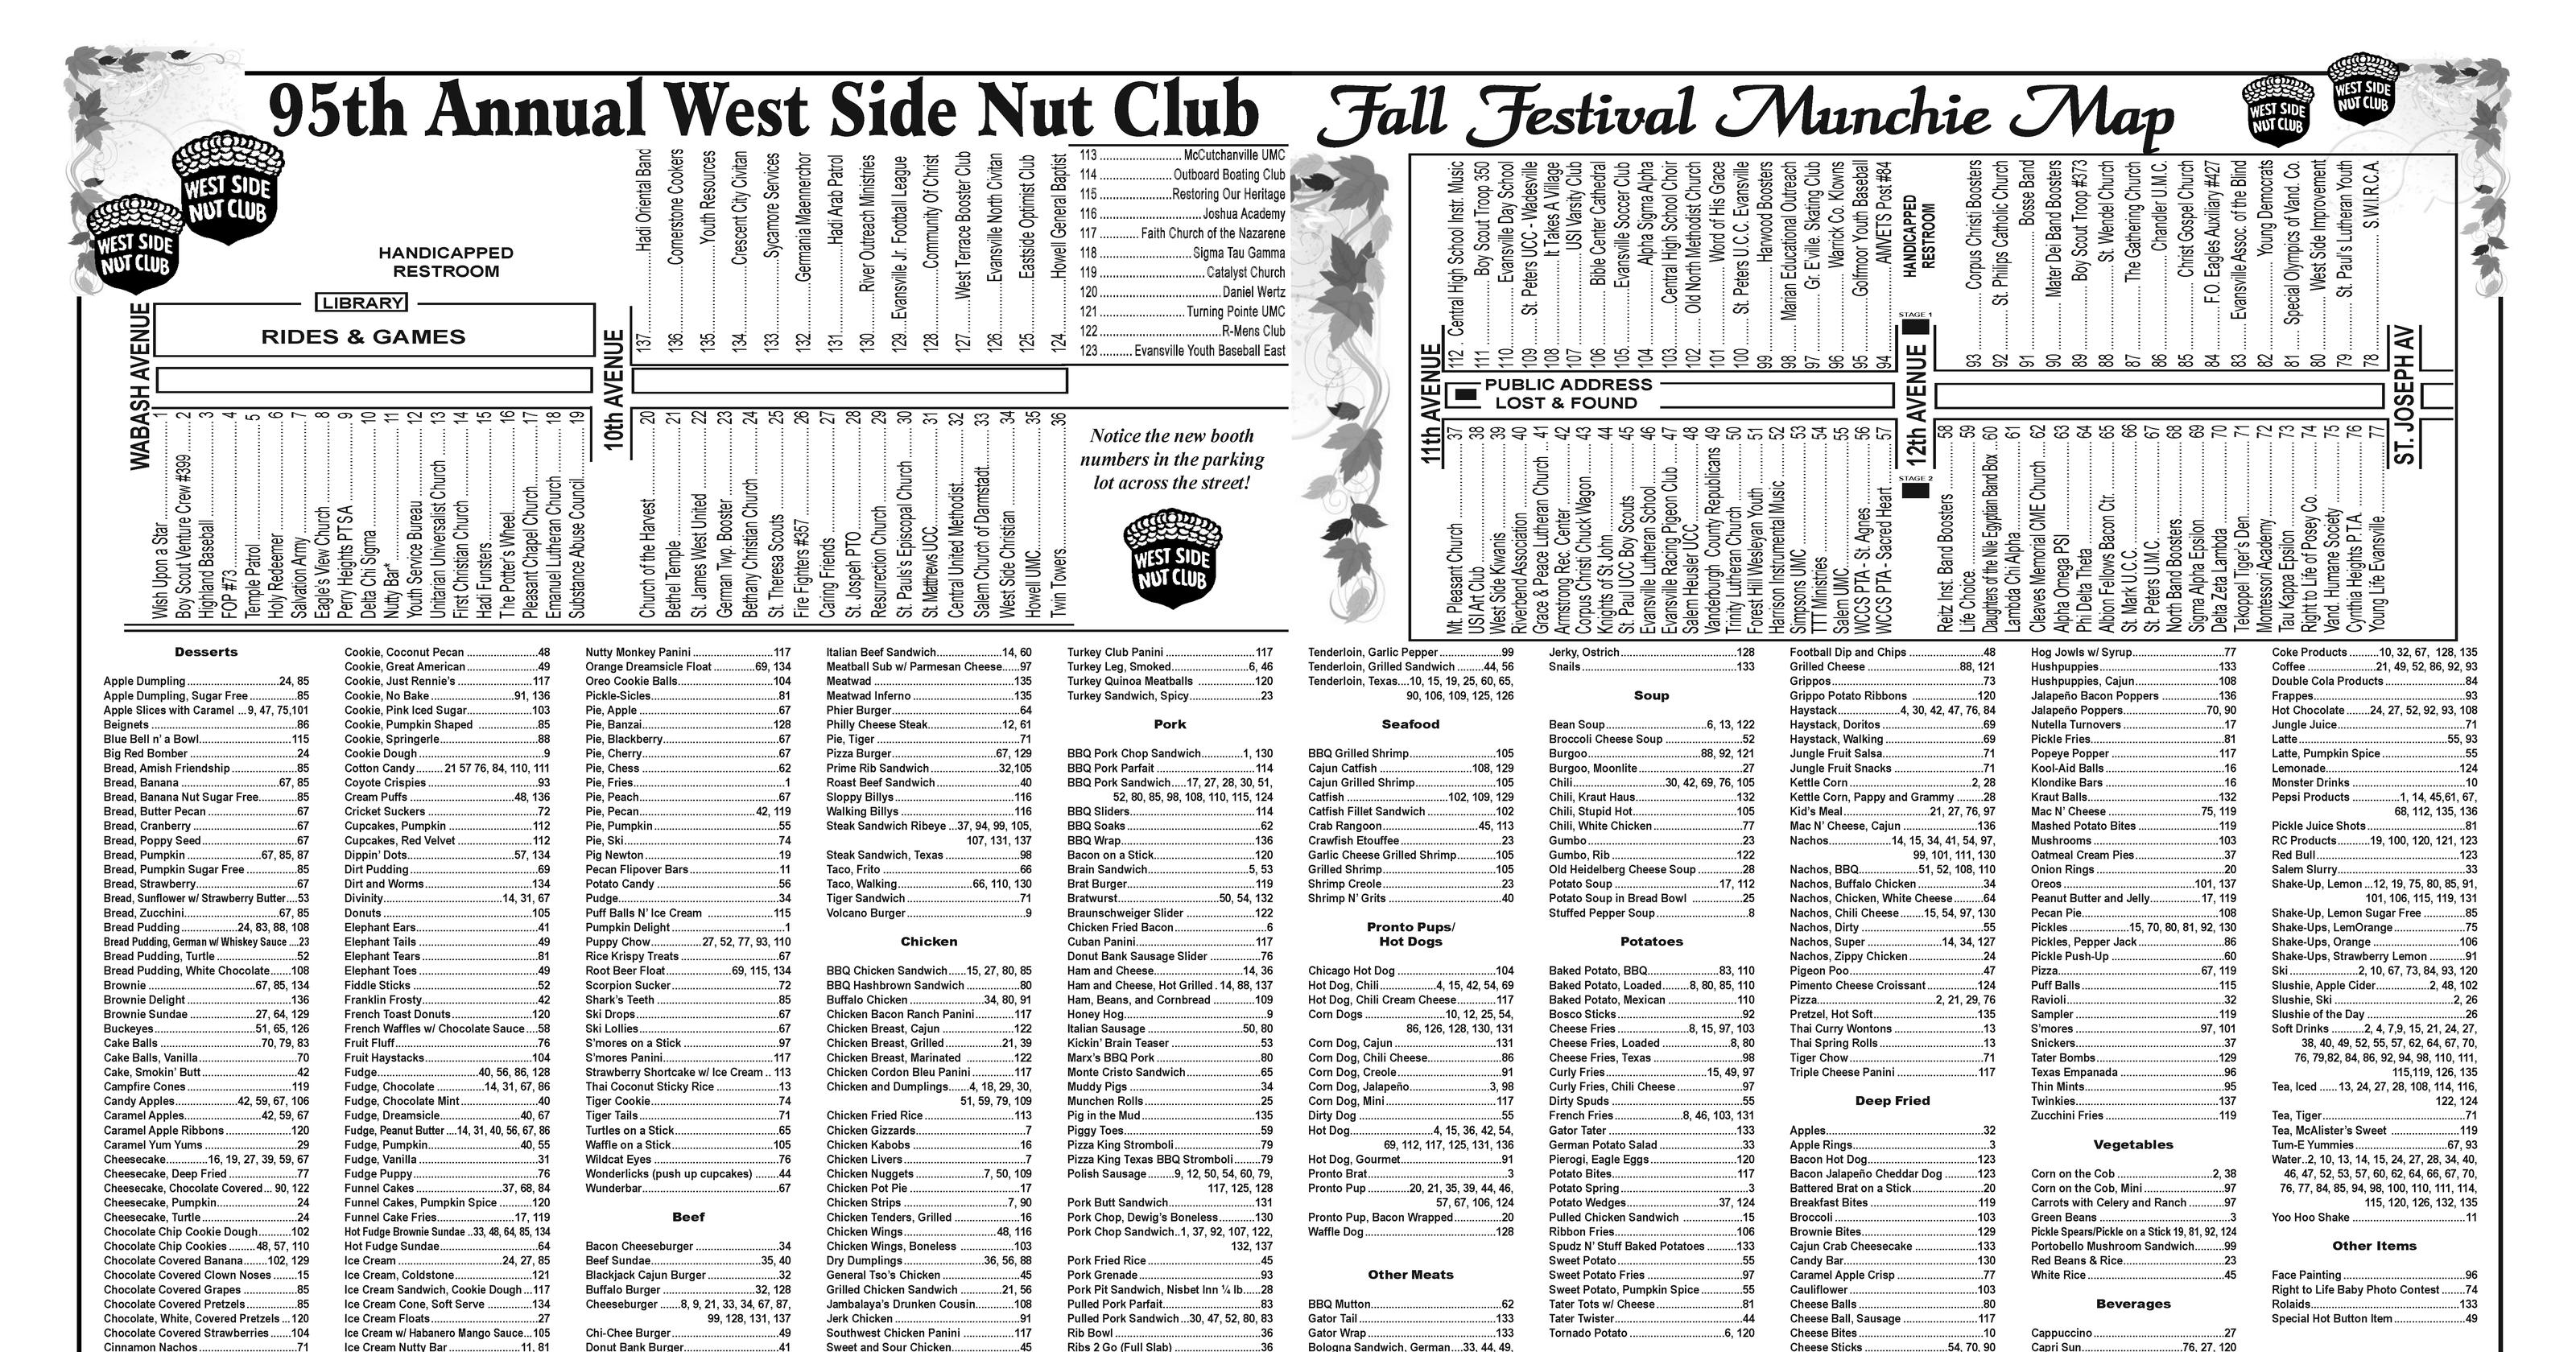 2016 Fall Festival Munchie Map released